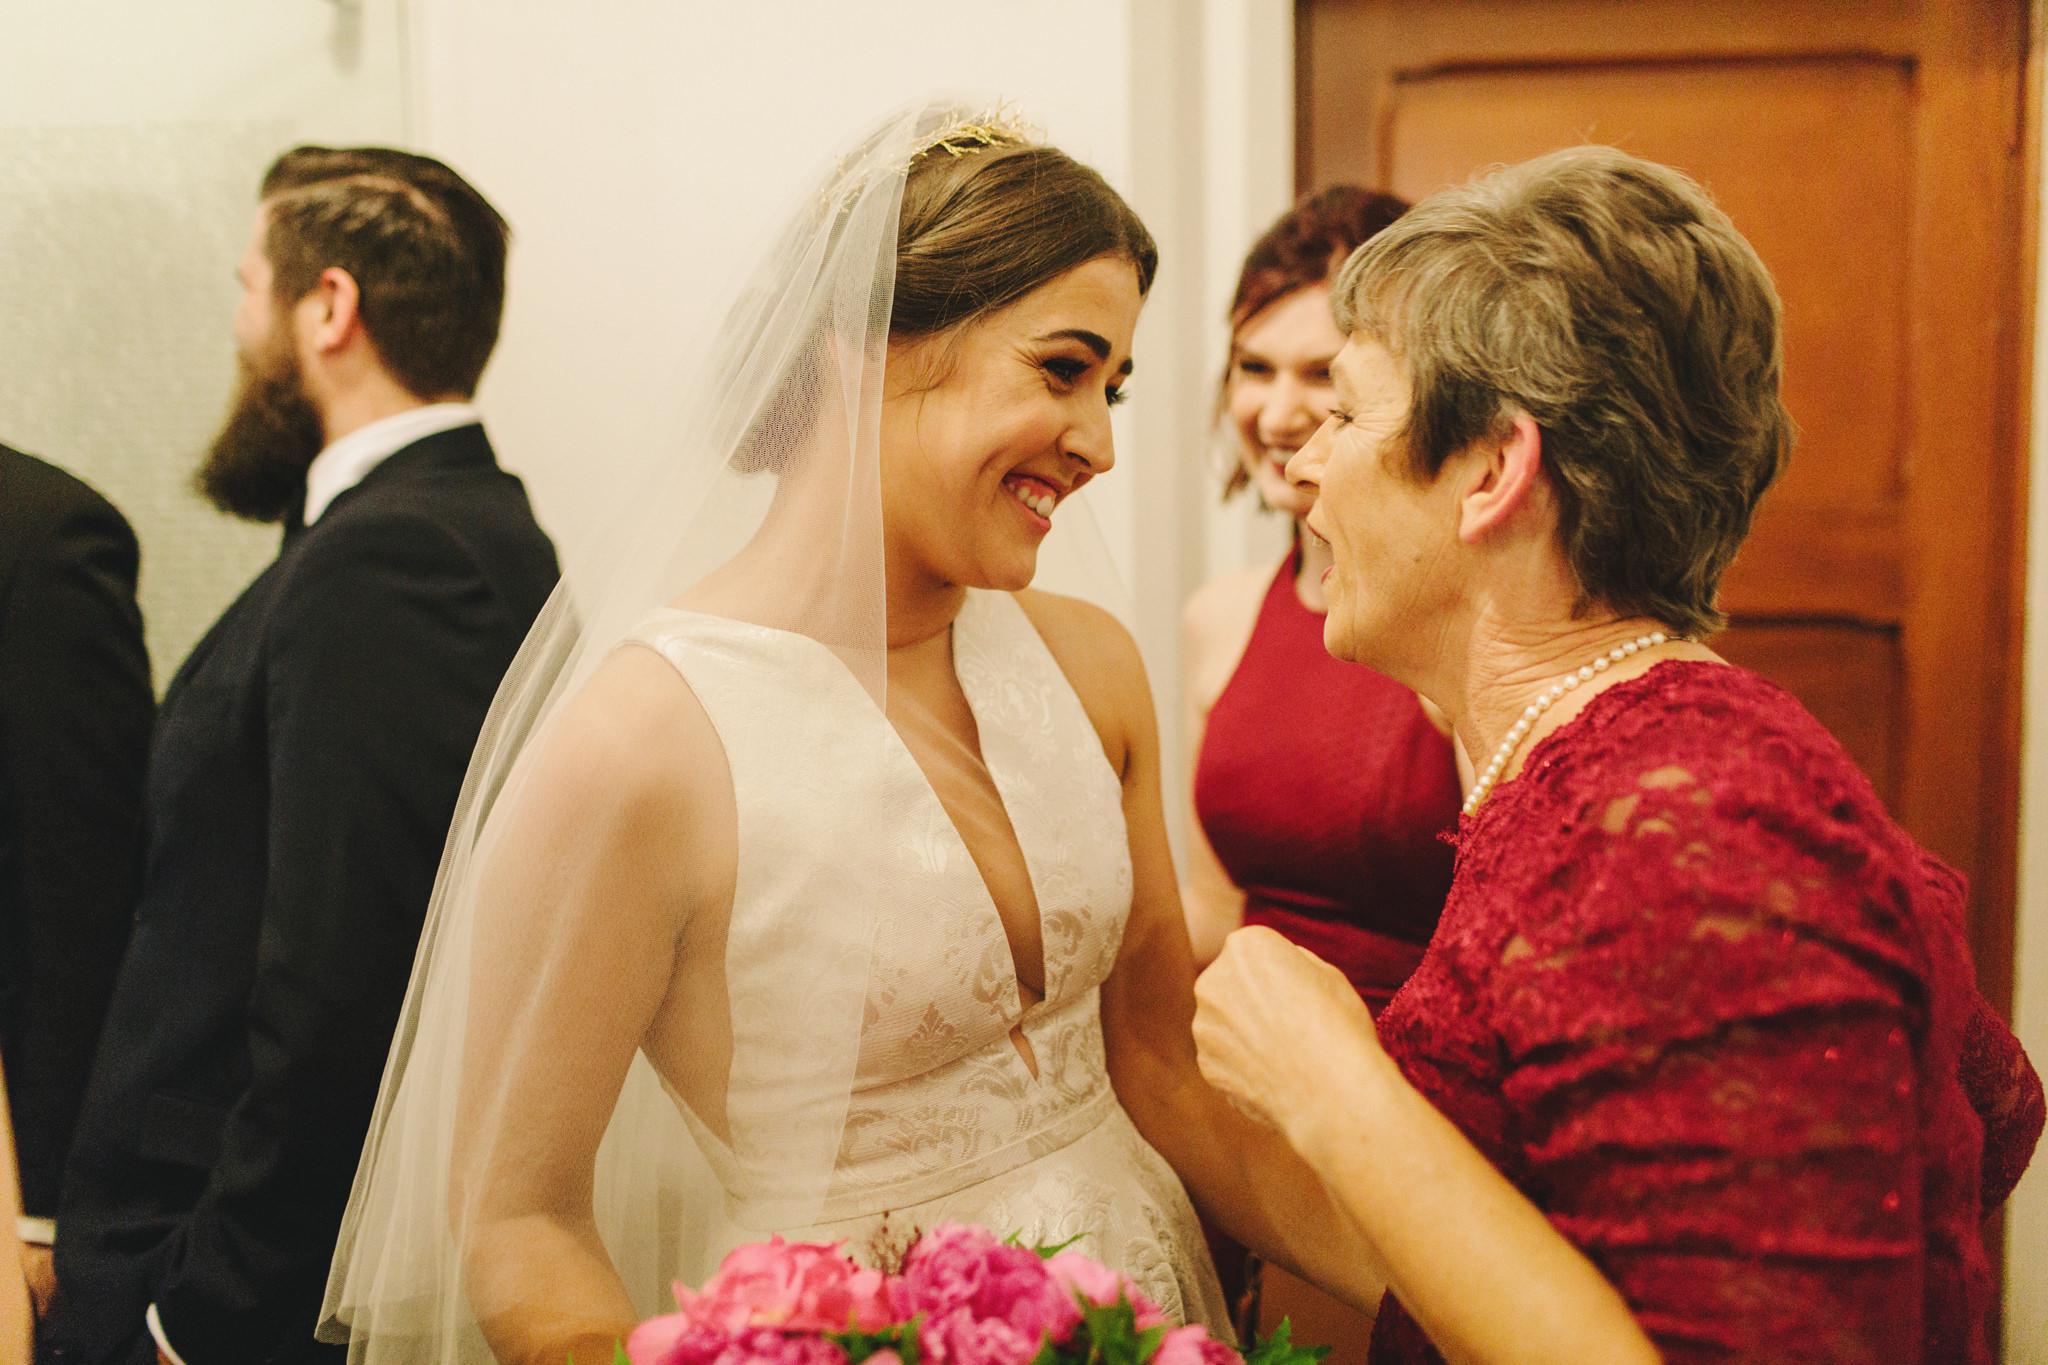 Abbotsford_Convent_Wedding_Peter_Anna072.JPG